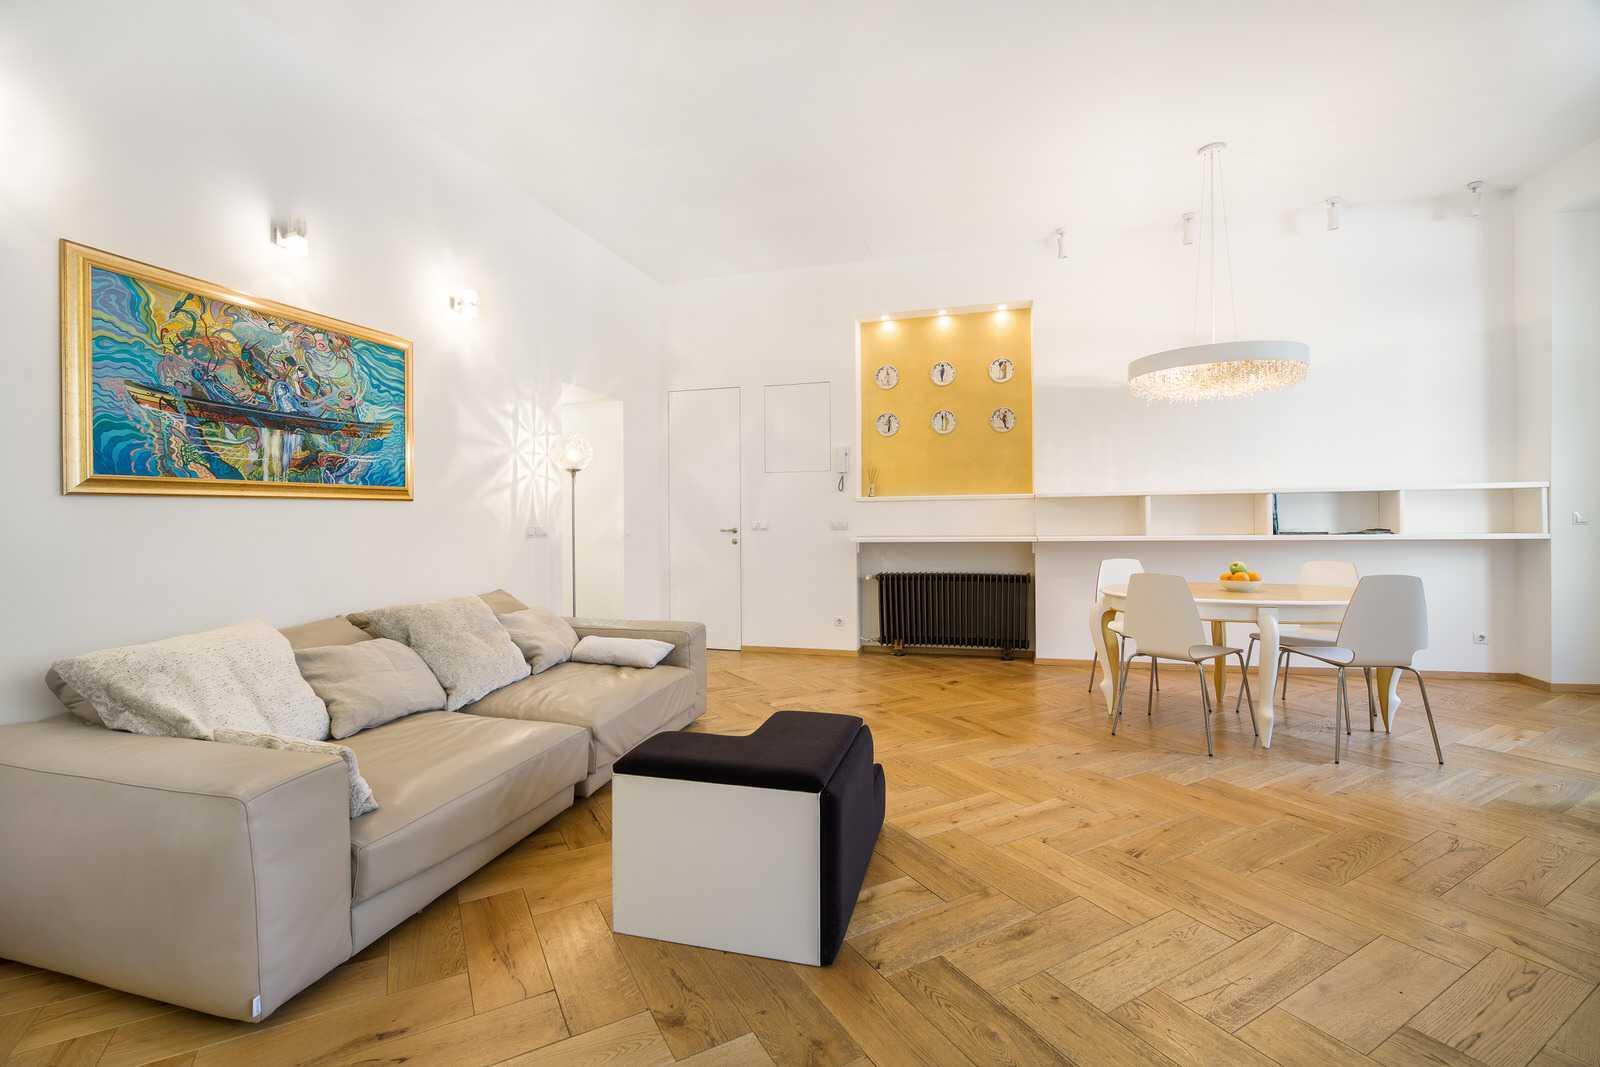 Ljubljana 2-bedroom Beethovnova apartment's soft living room sofa